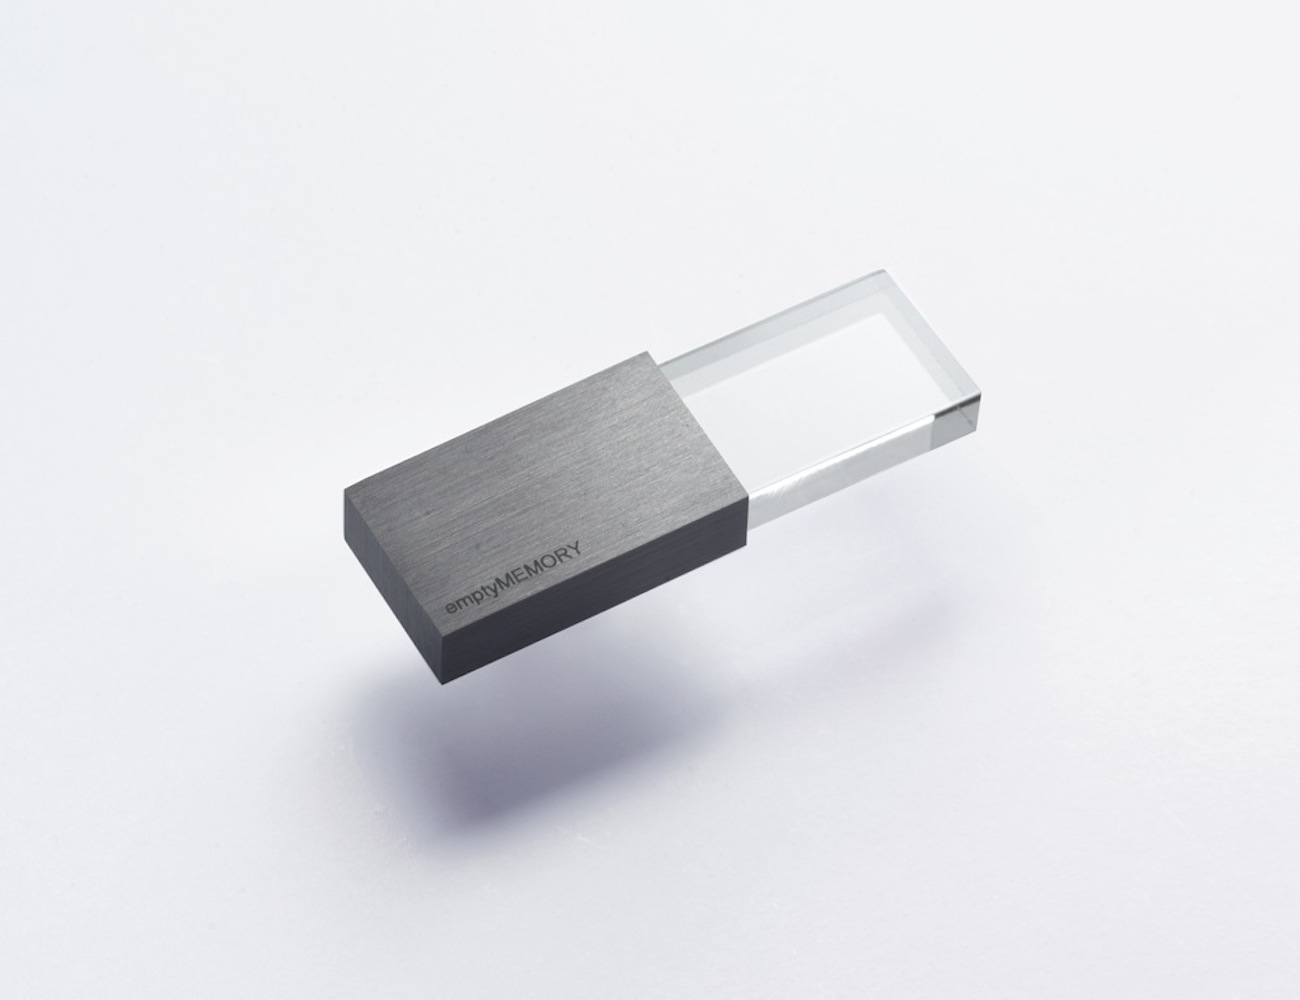 Empty Memory USB Drives